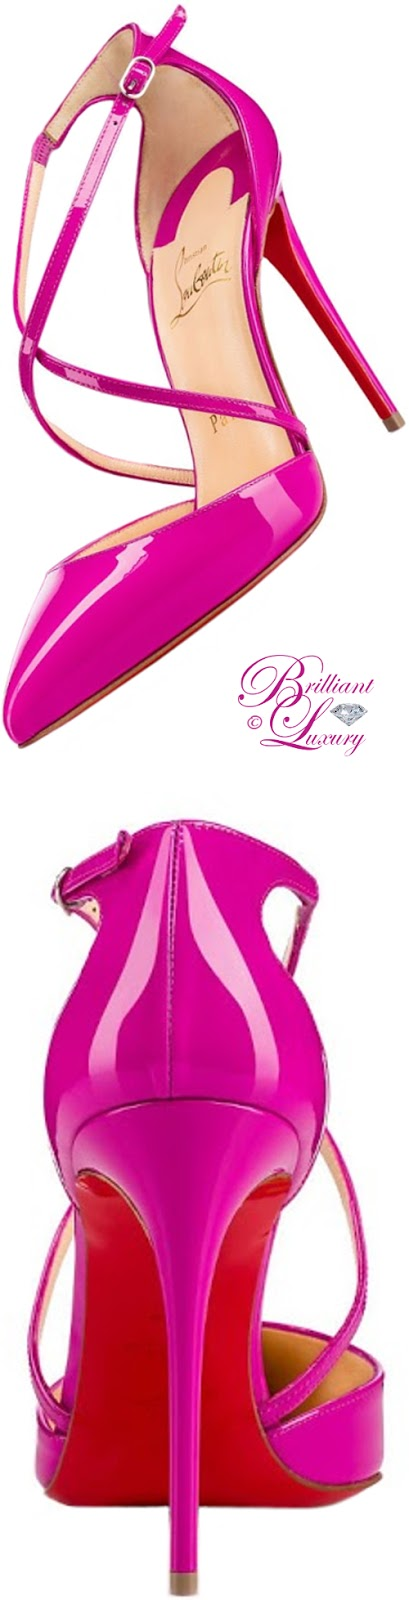 Brilliant Luxury ♦ Christian Louboutin Cross Blade sandal